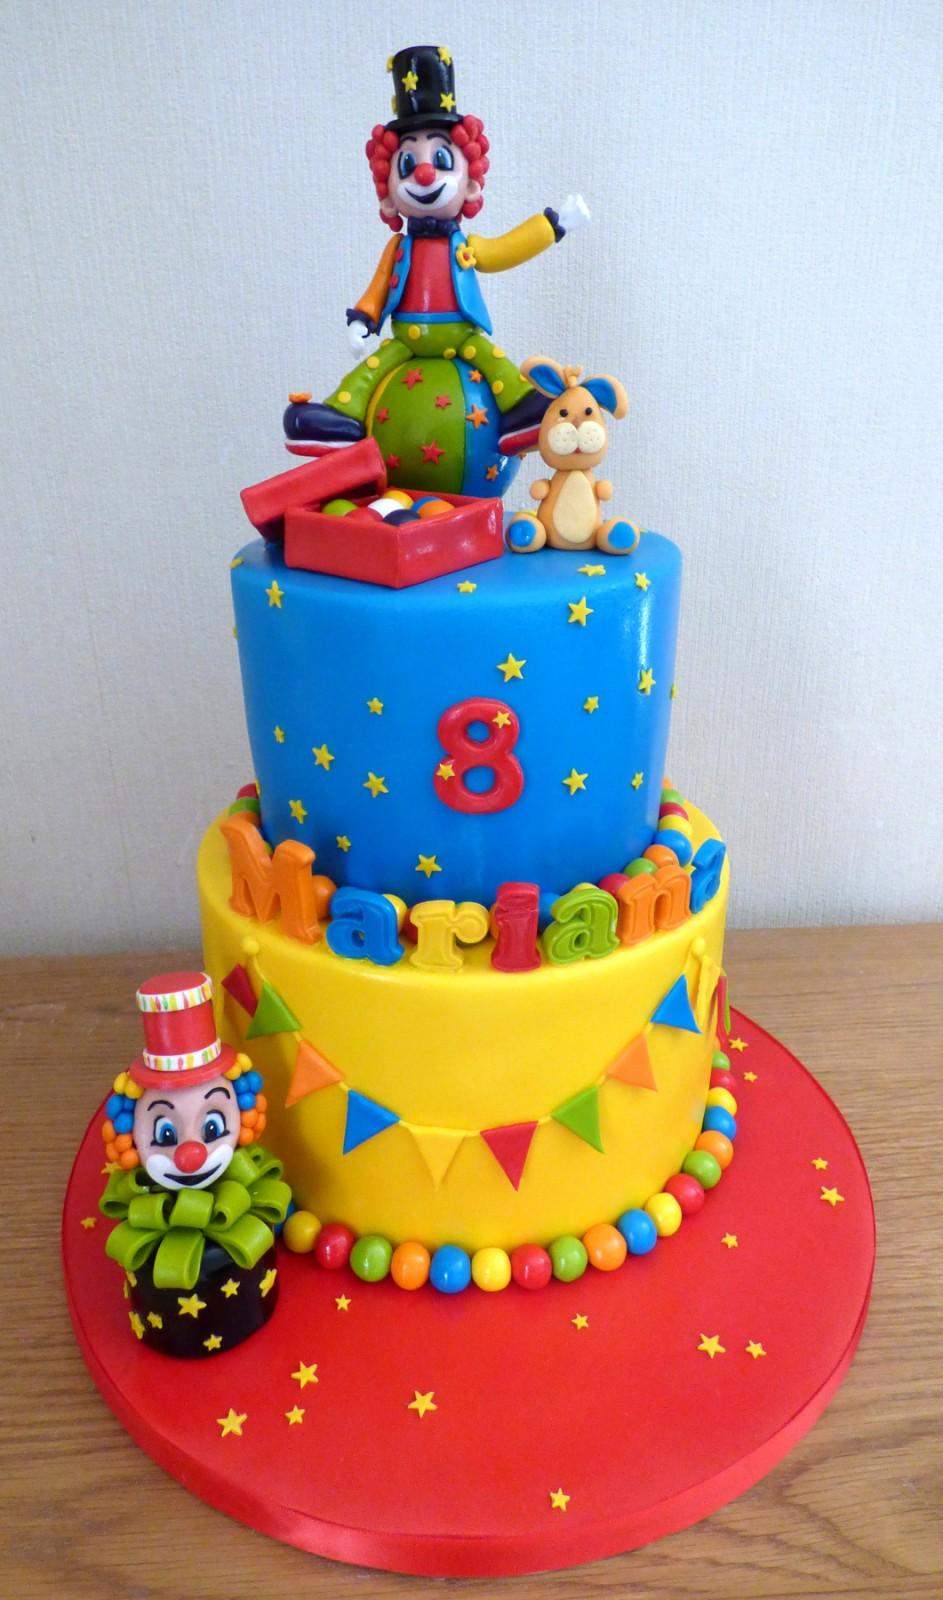 Miraculous 2 Tier Clown Themed Birthday Cake Susies Cakes Personalised Birthday Cards Beptaeletsinfo